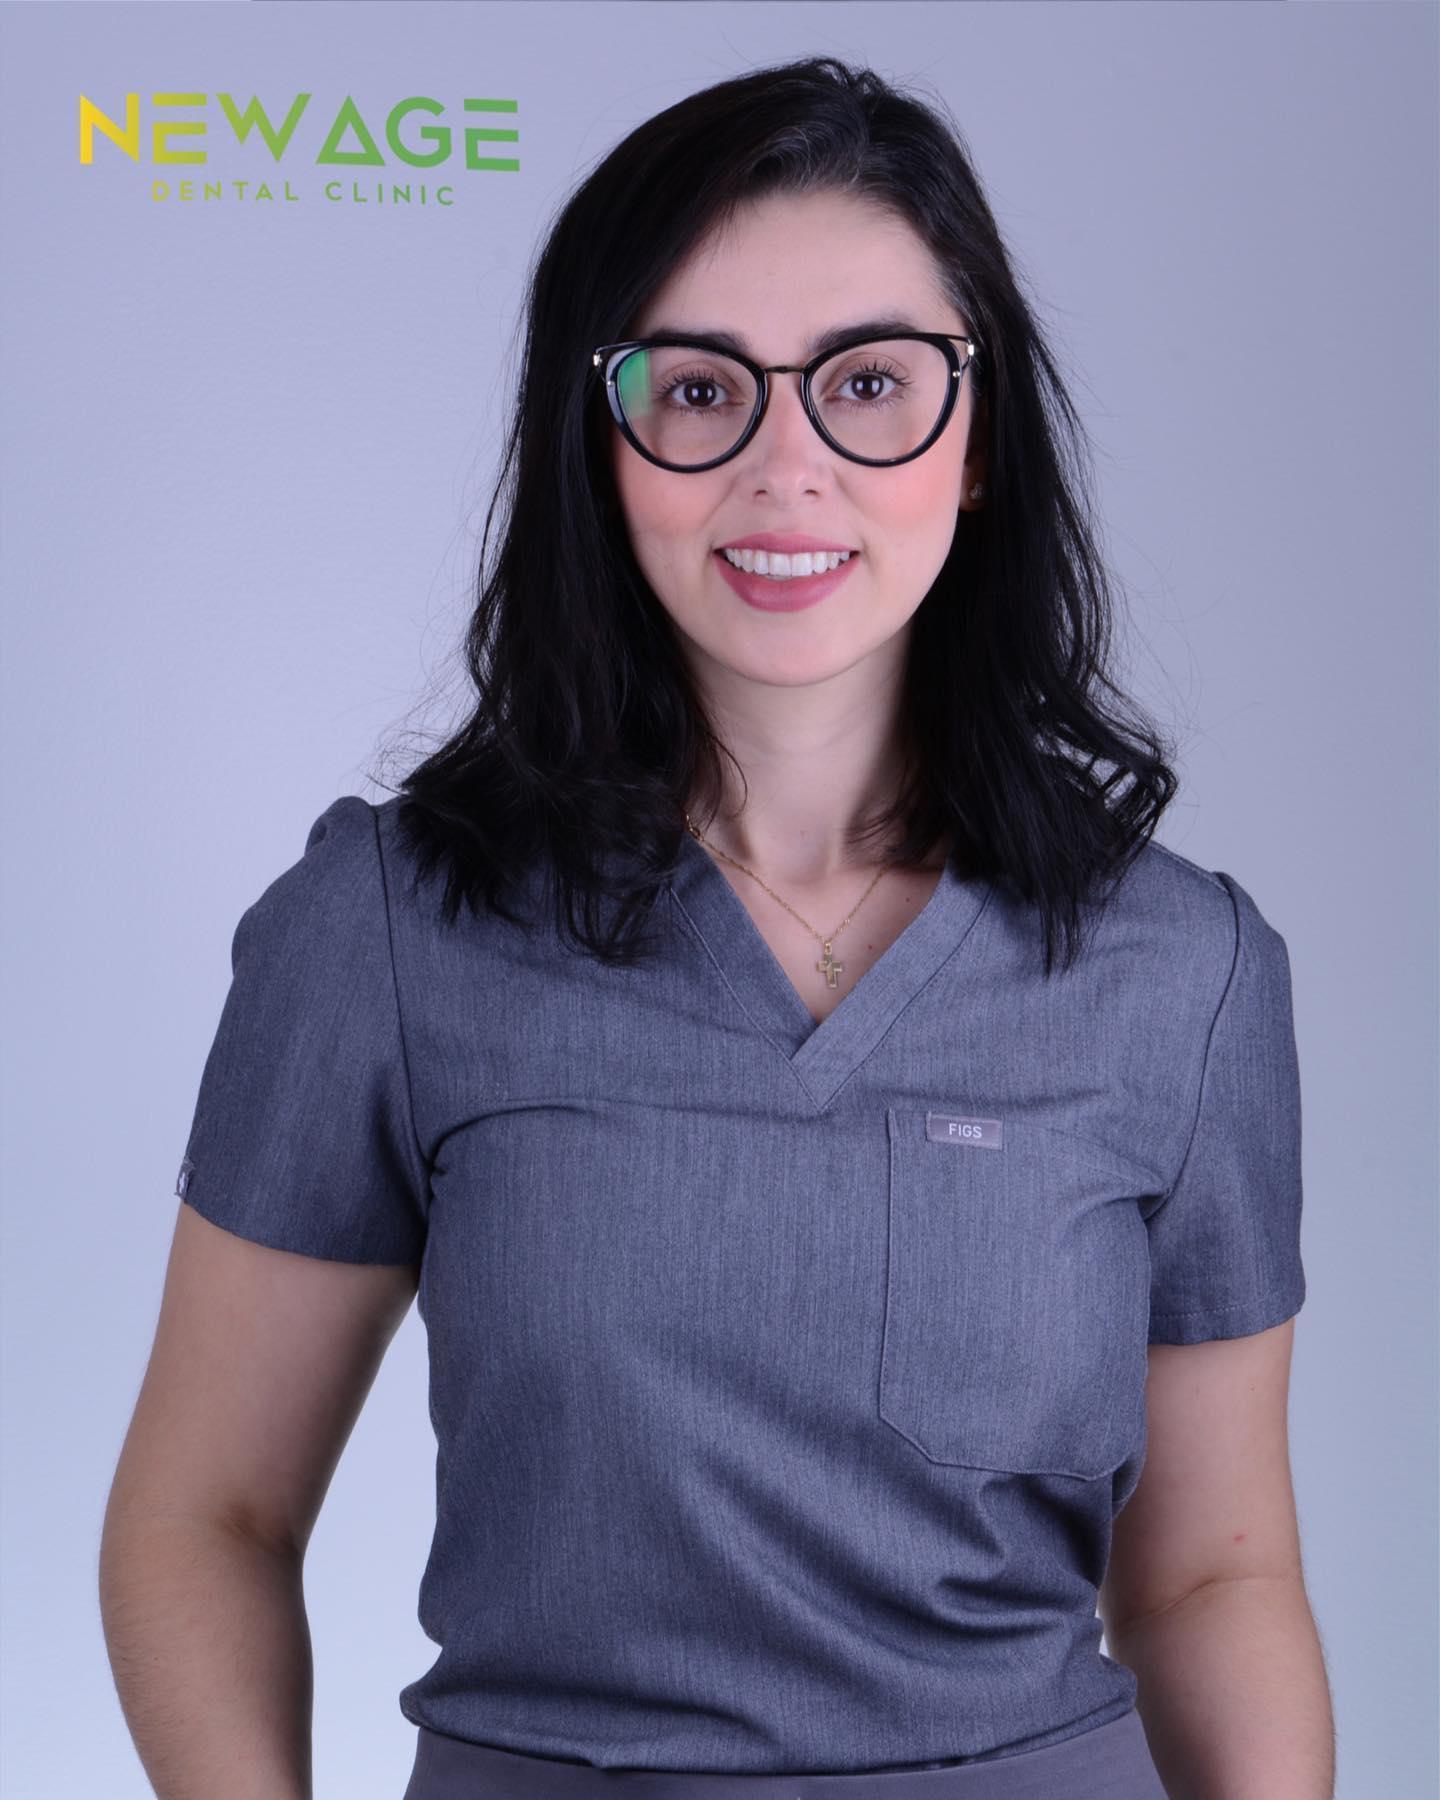 Dr. Silvia Guzman. cosmetic dentist in Tijuana